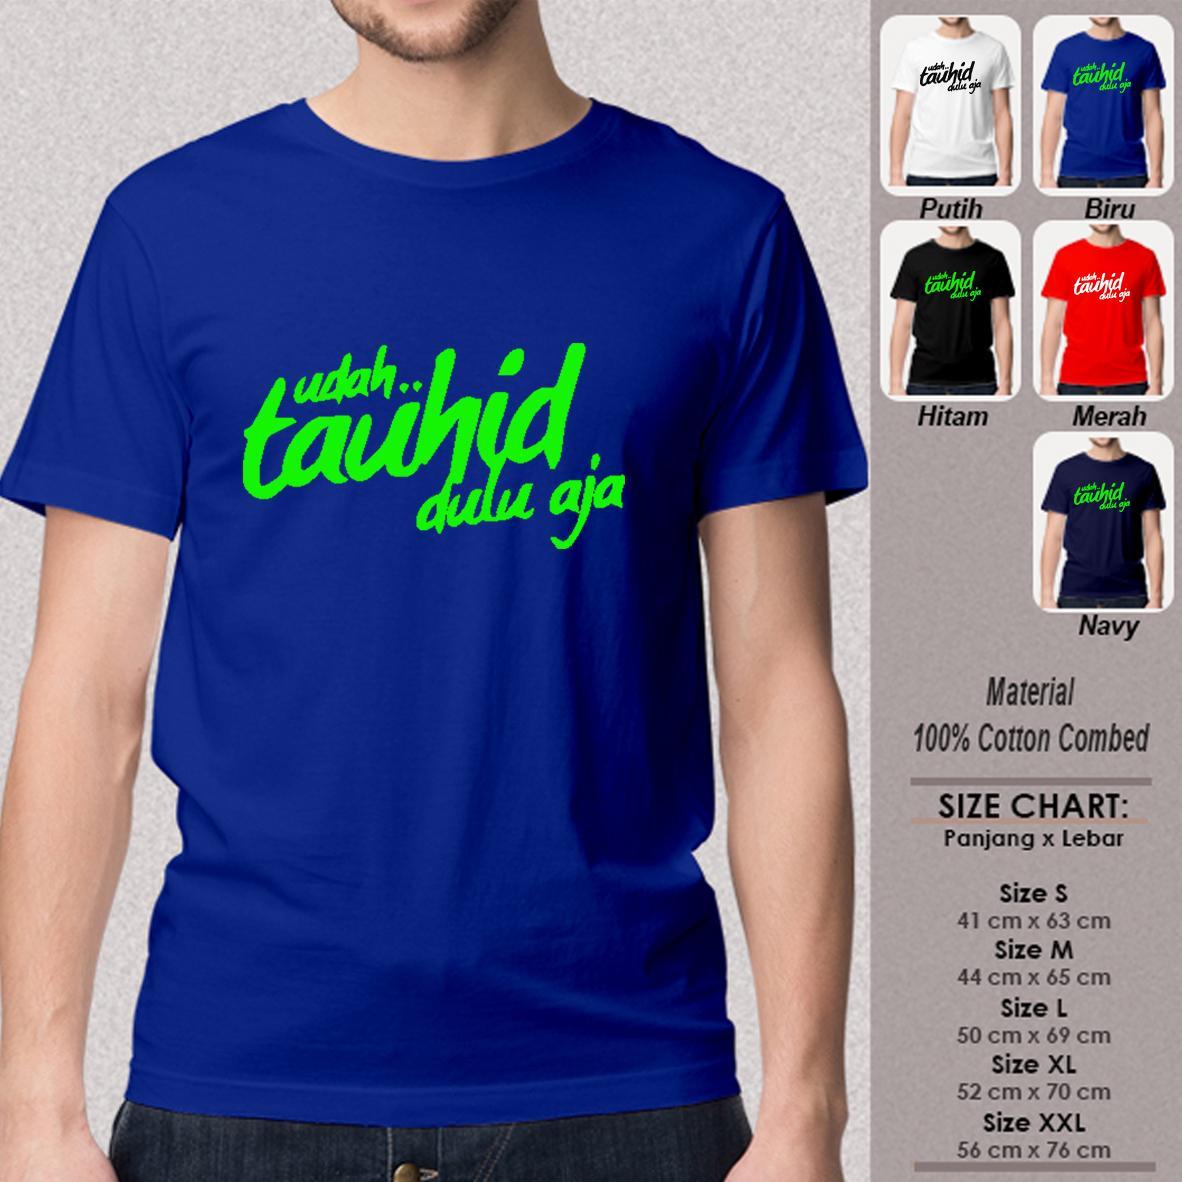 Suppliernatgeo - Kaos T-Shirt Distro / Kaos Pria / Tshirt Pria / Distro Pria / Baju Pria Premium Dakwah Muslim SN-LSMSMY327 UDAH TAUHID AJAH DULU